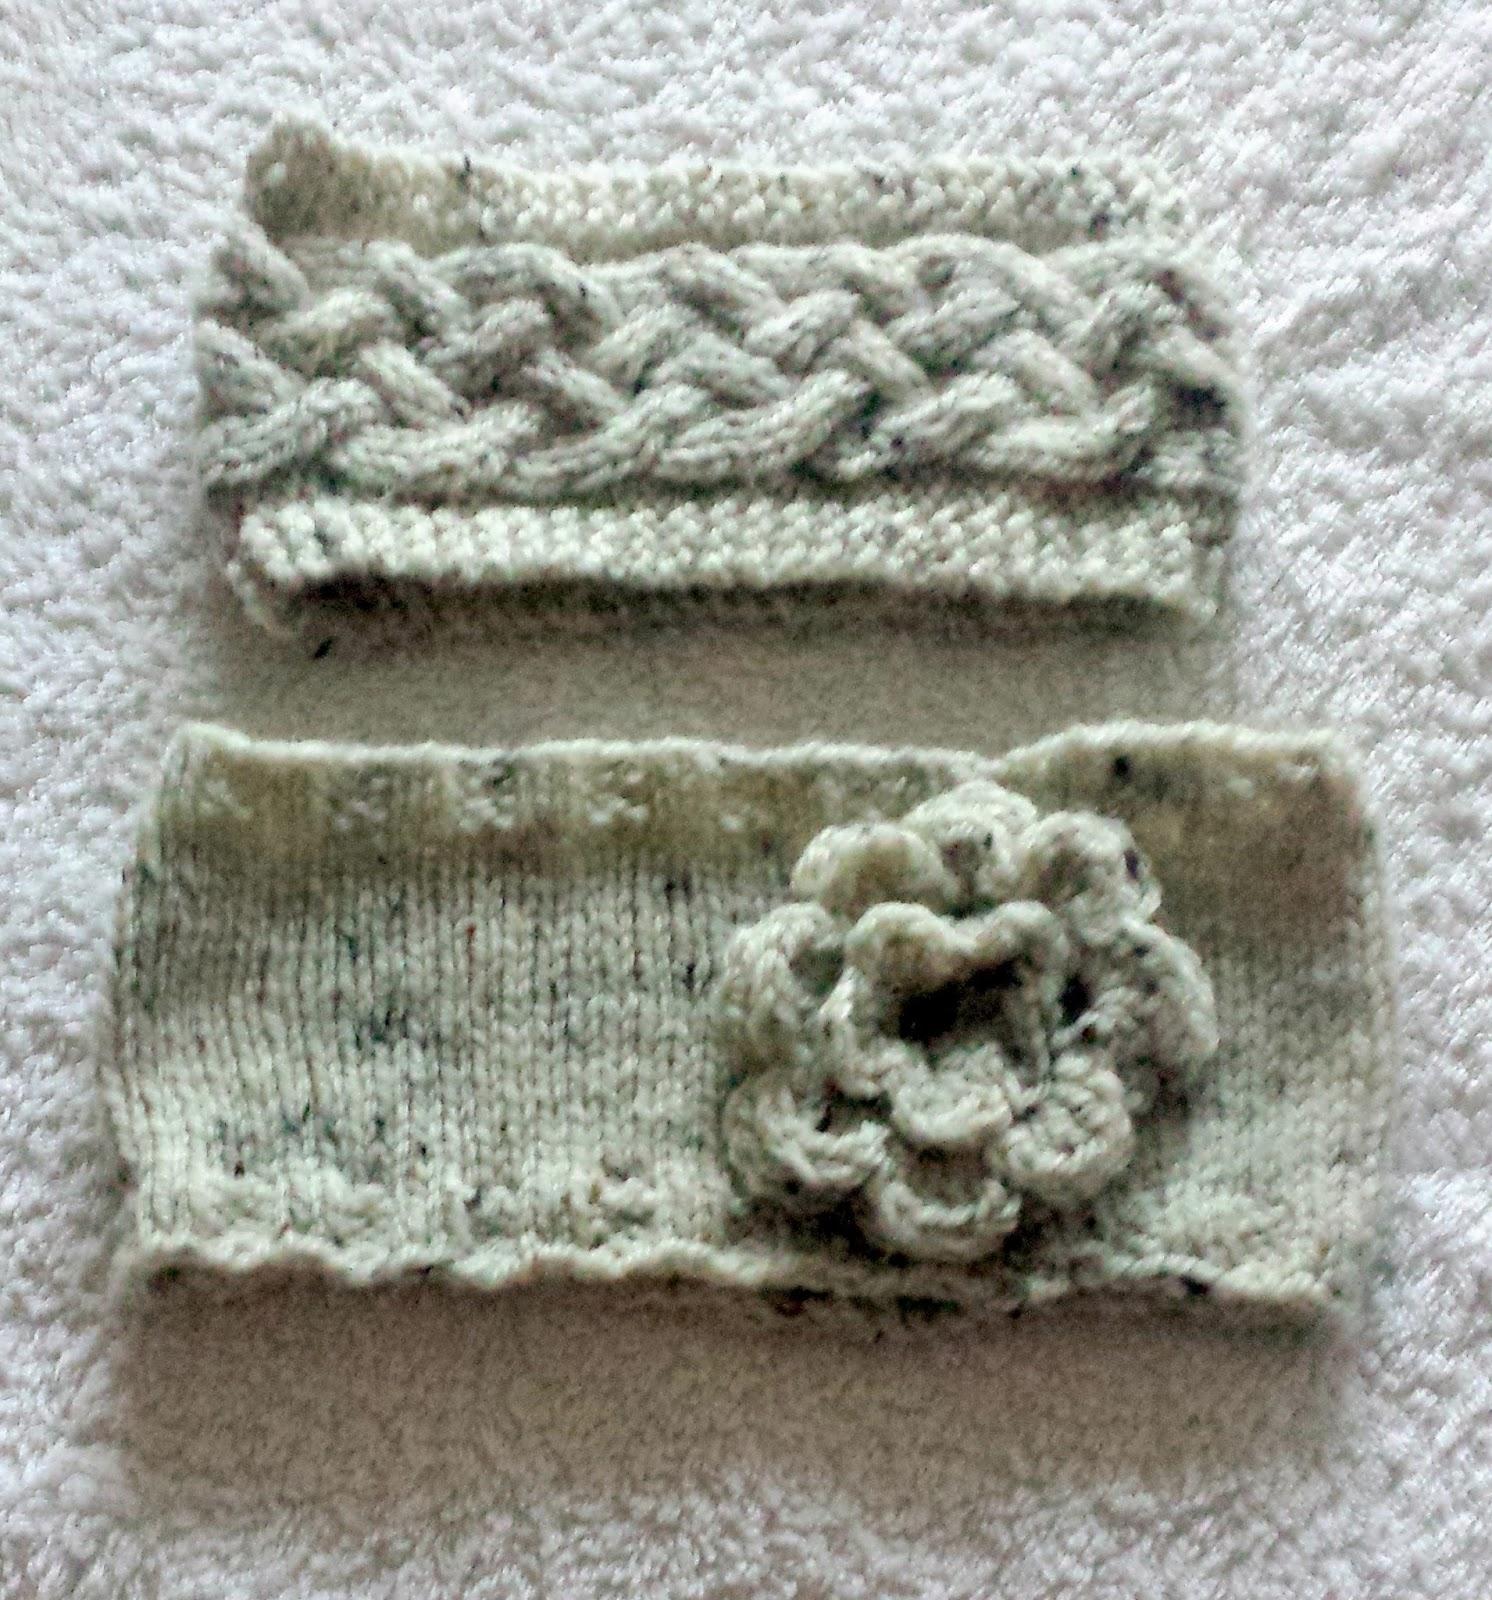 Sophies Knit Stuff: Knitted Headbands: Aran Wool Ear Warmers to Finish O...